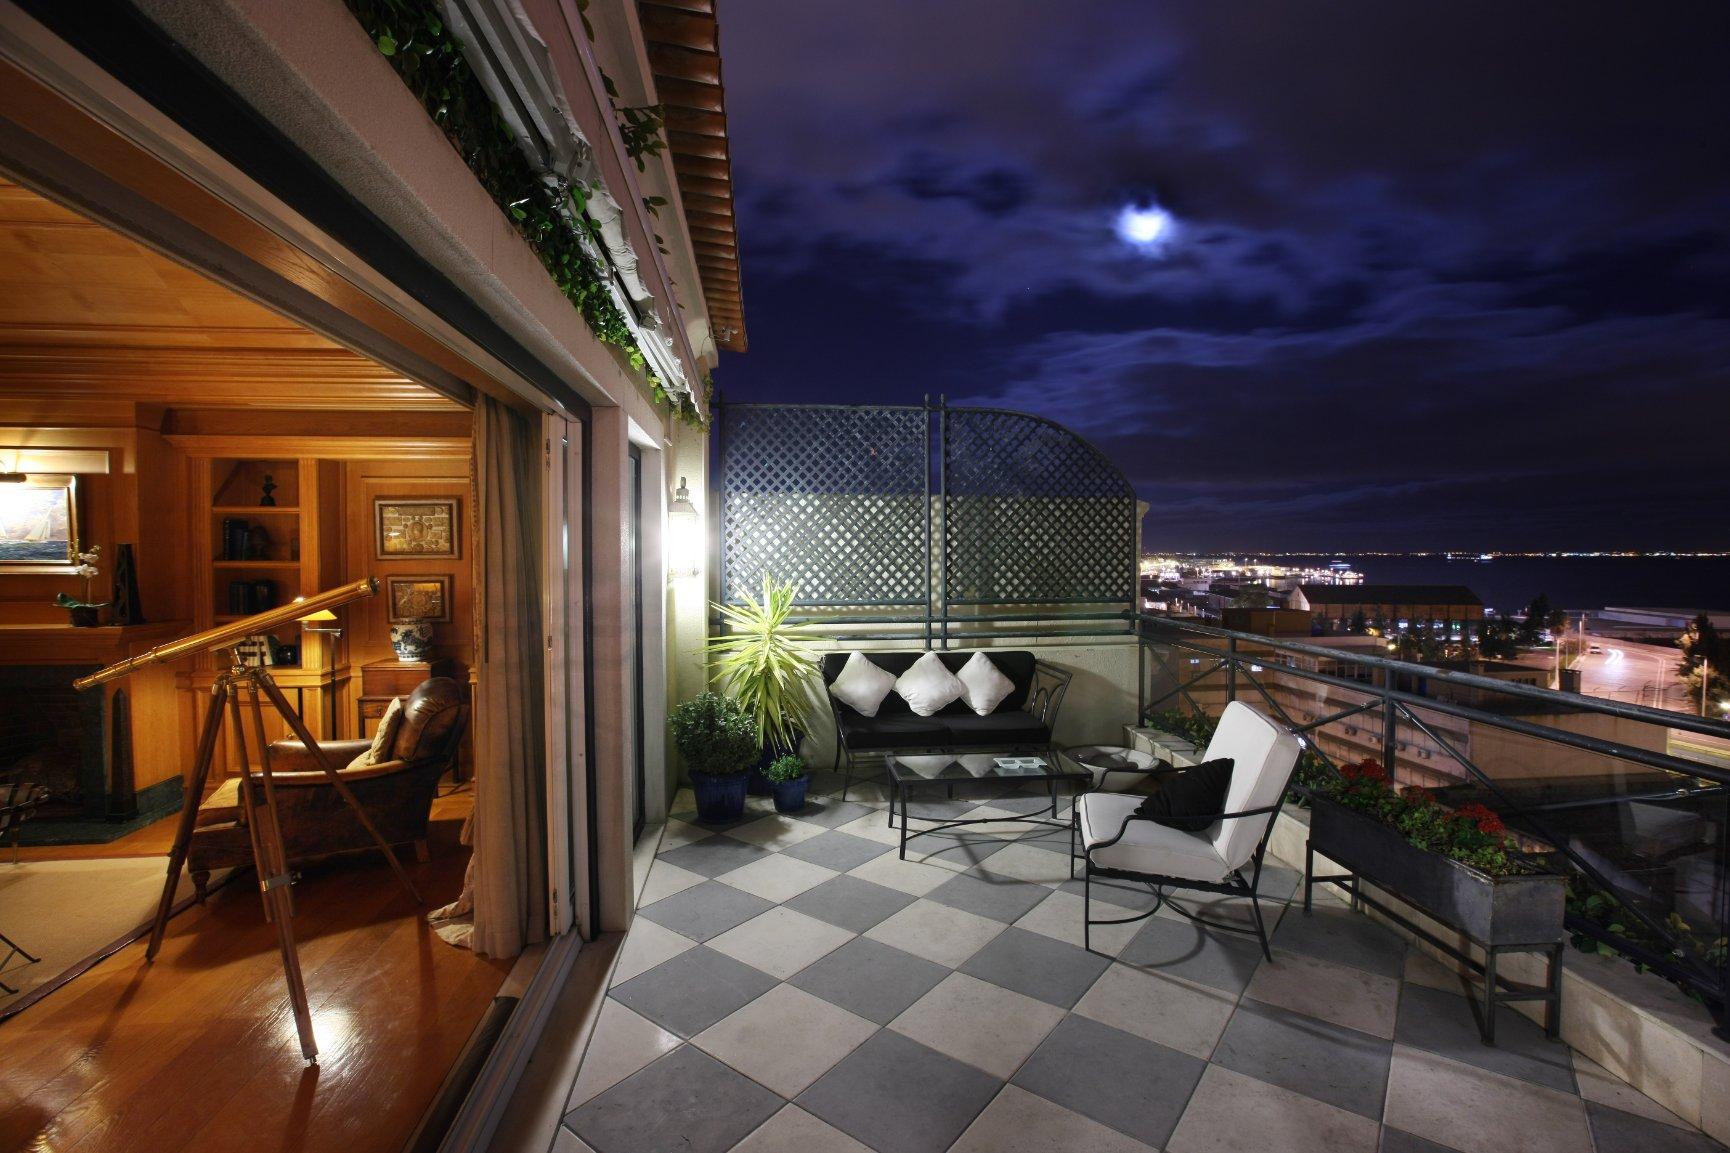 Hoteis Heritage Lisboa - As Janelas Verdes noite